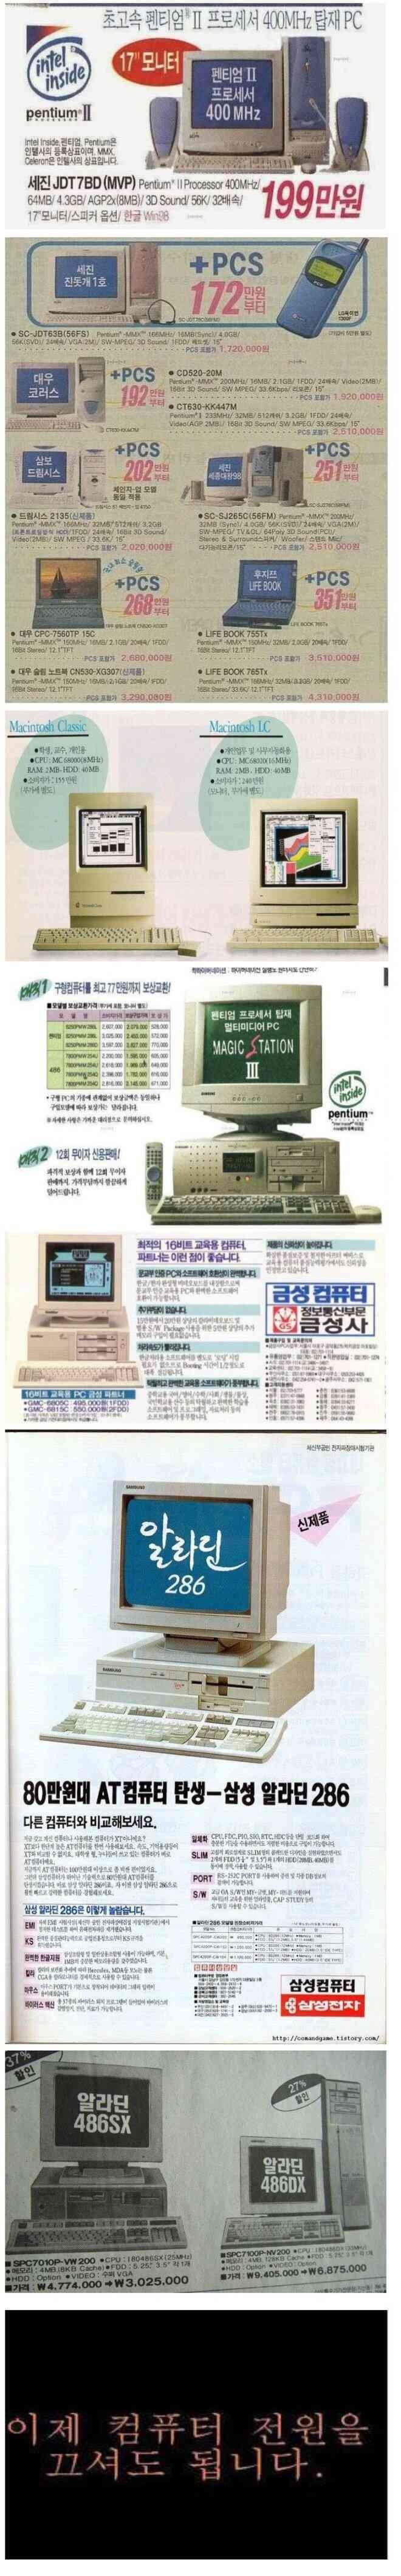 45AB7B1C-BDAF-49C9-BB11-F72BF37D5727.jpeg : 90년대 콤퓨타 가격